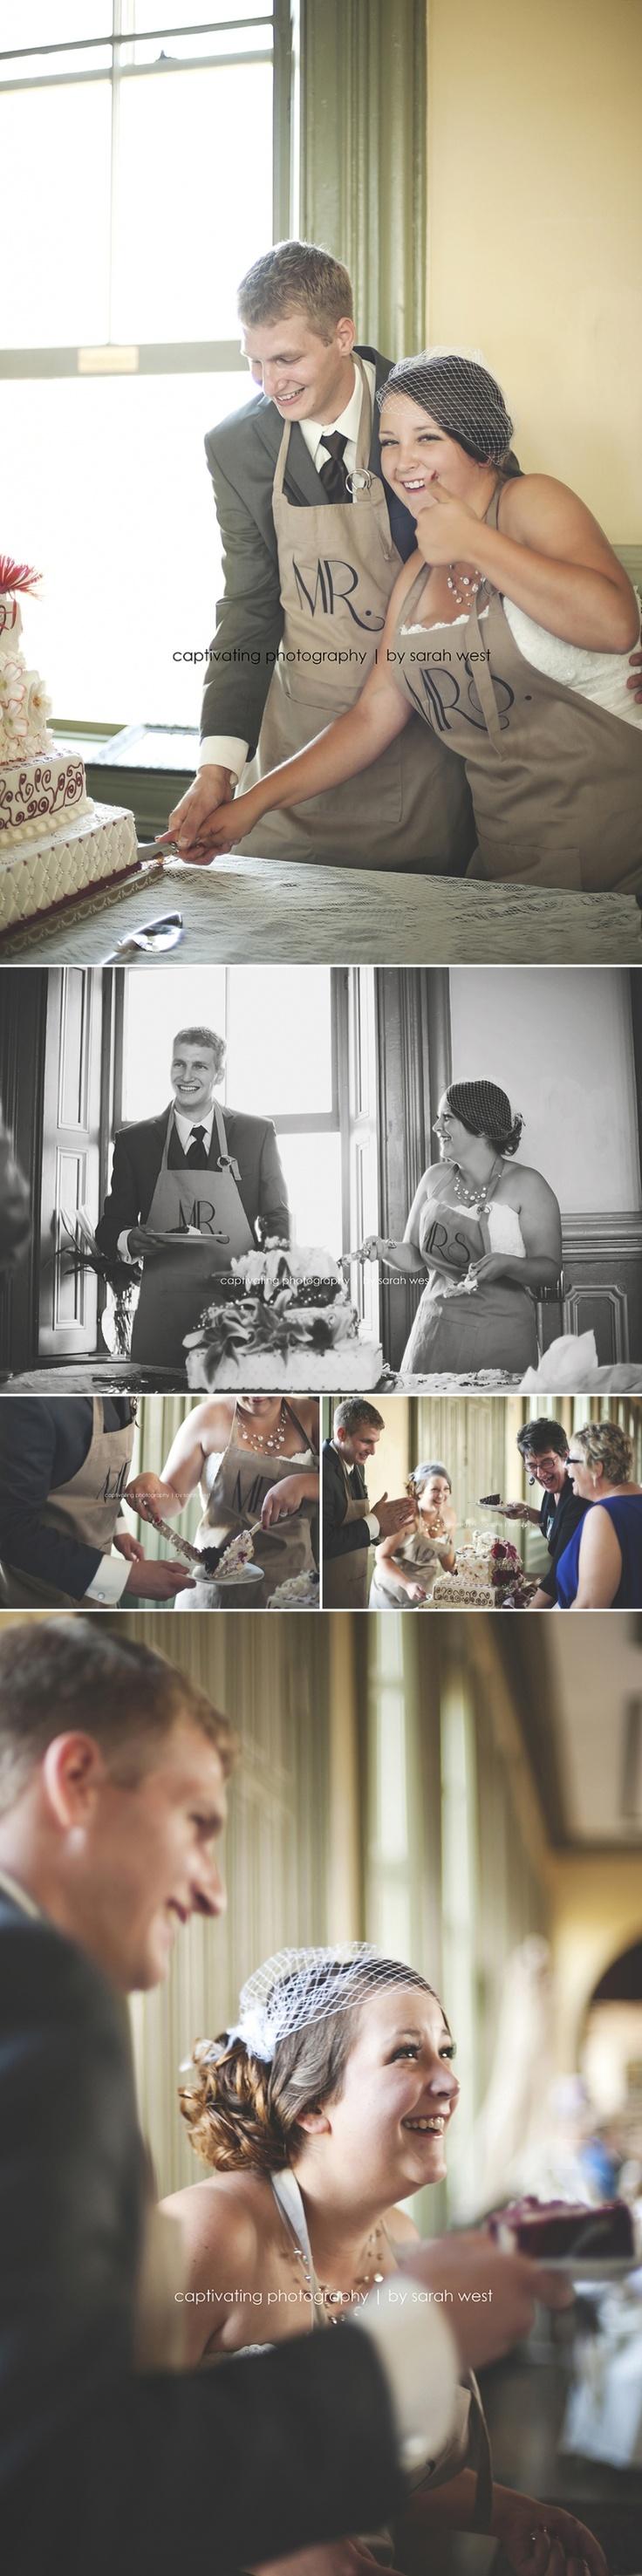 Beautiful, Vintage wedding at the St. Thomas train station {st. thomas ontario | Wedding photograper} » Captivating Photography by Sarah West